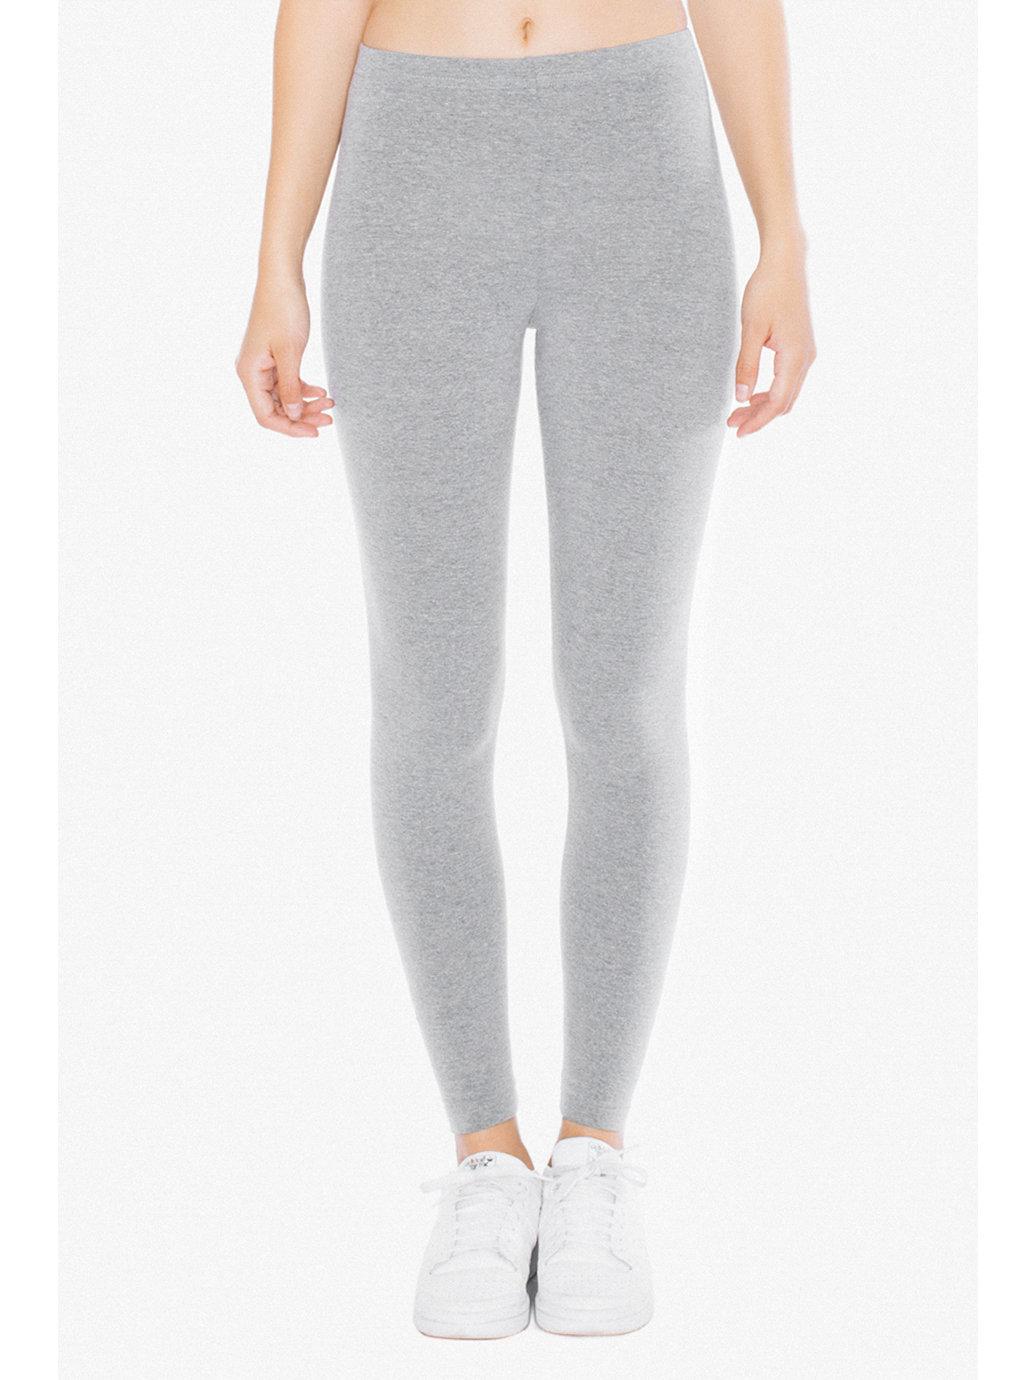 Cotton Spandex Jersey Yoga Pant | American Apparel